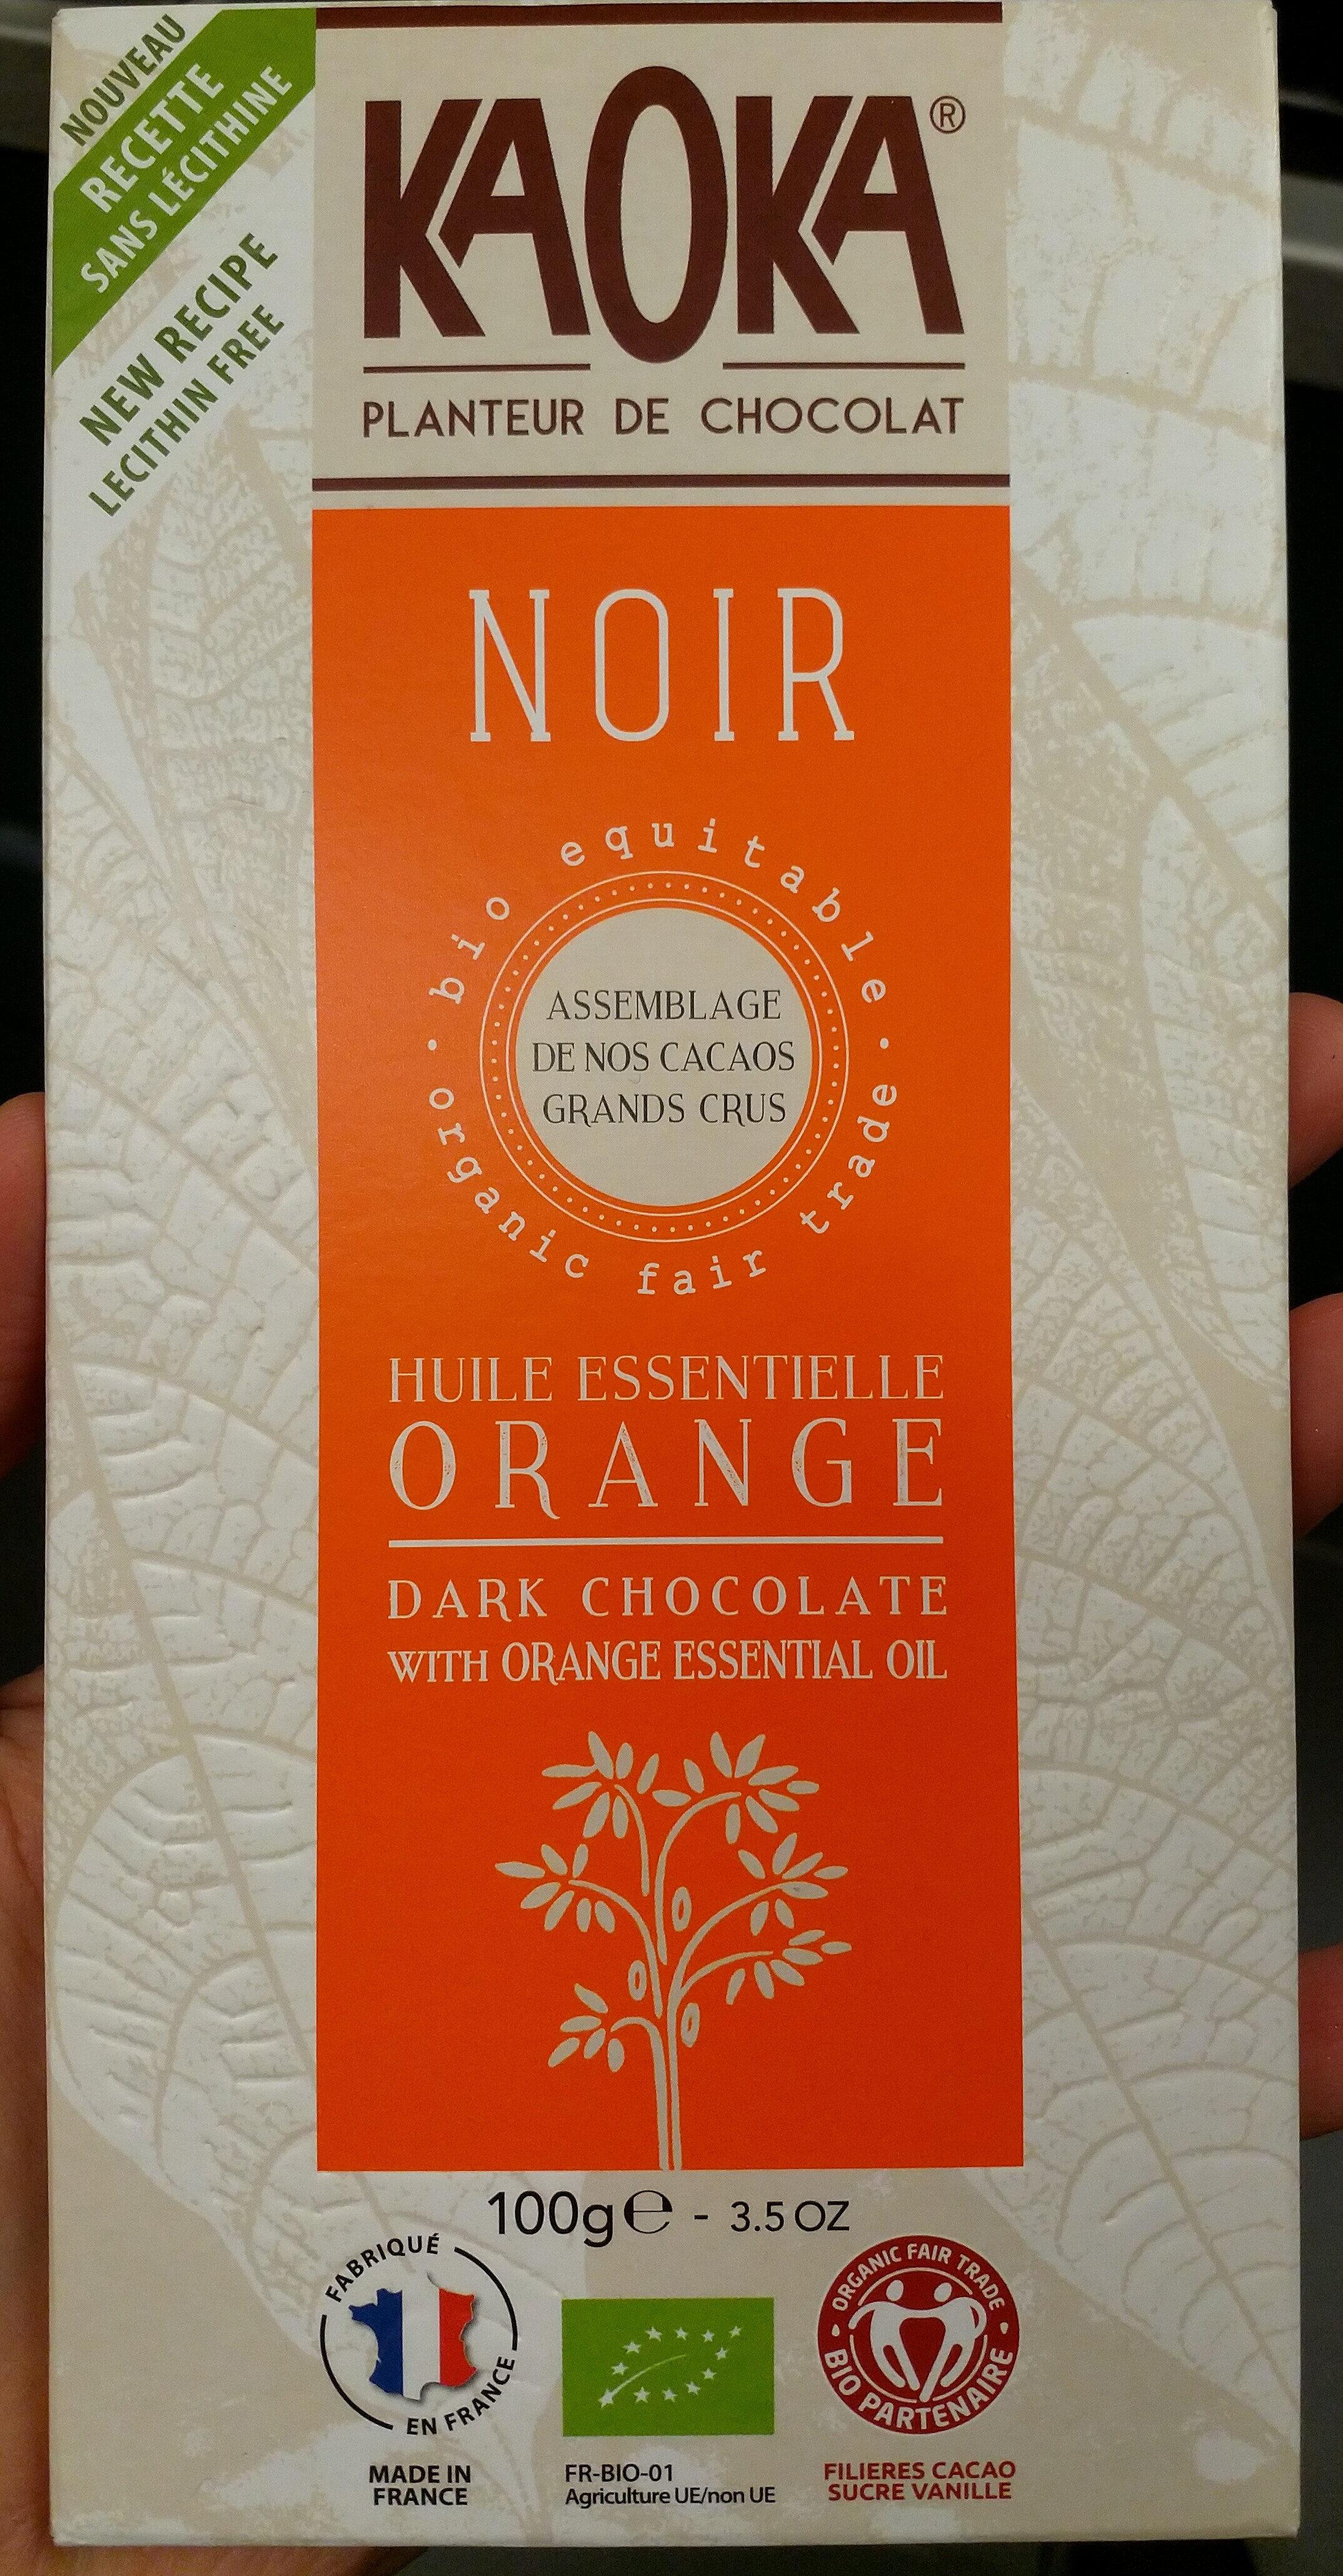 Chocolat noir huile essentielle orange - Product - nl